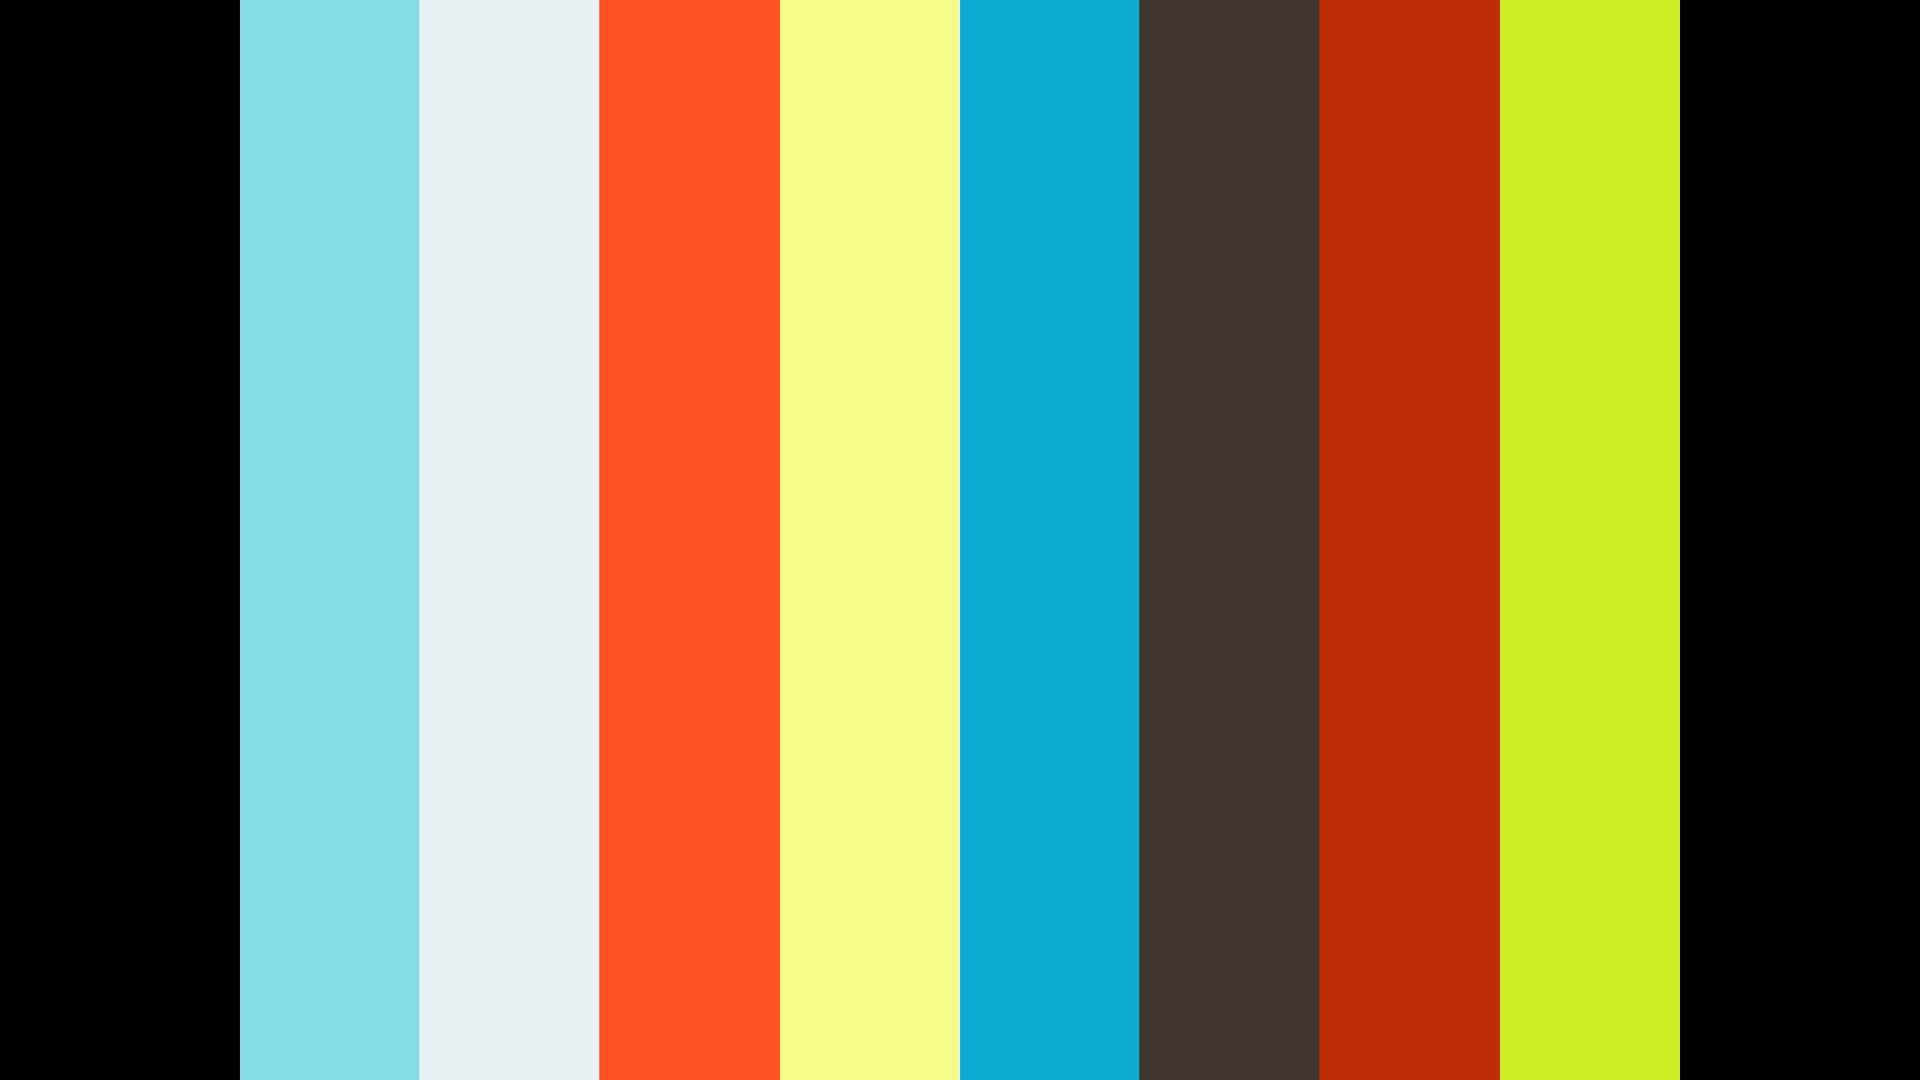 Xmas Promo 2020 NdustrialStudios - StudioMadison